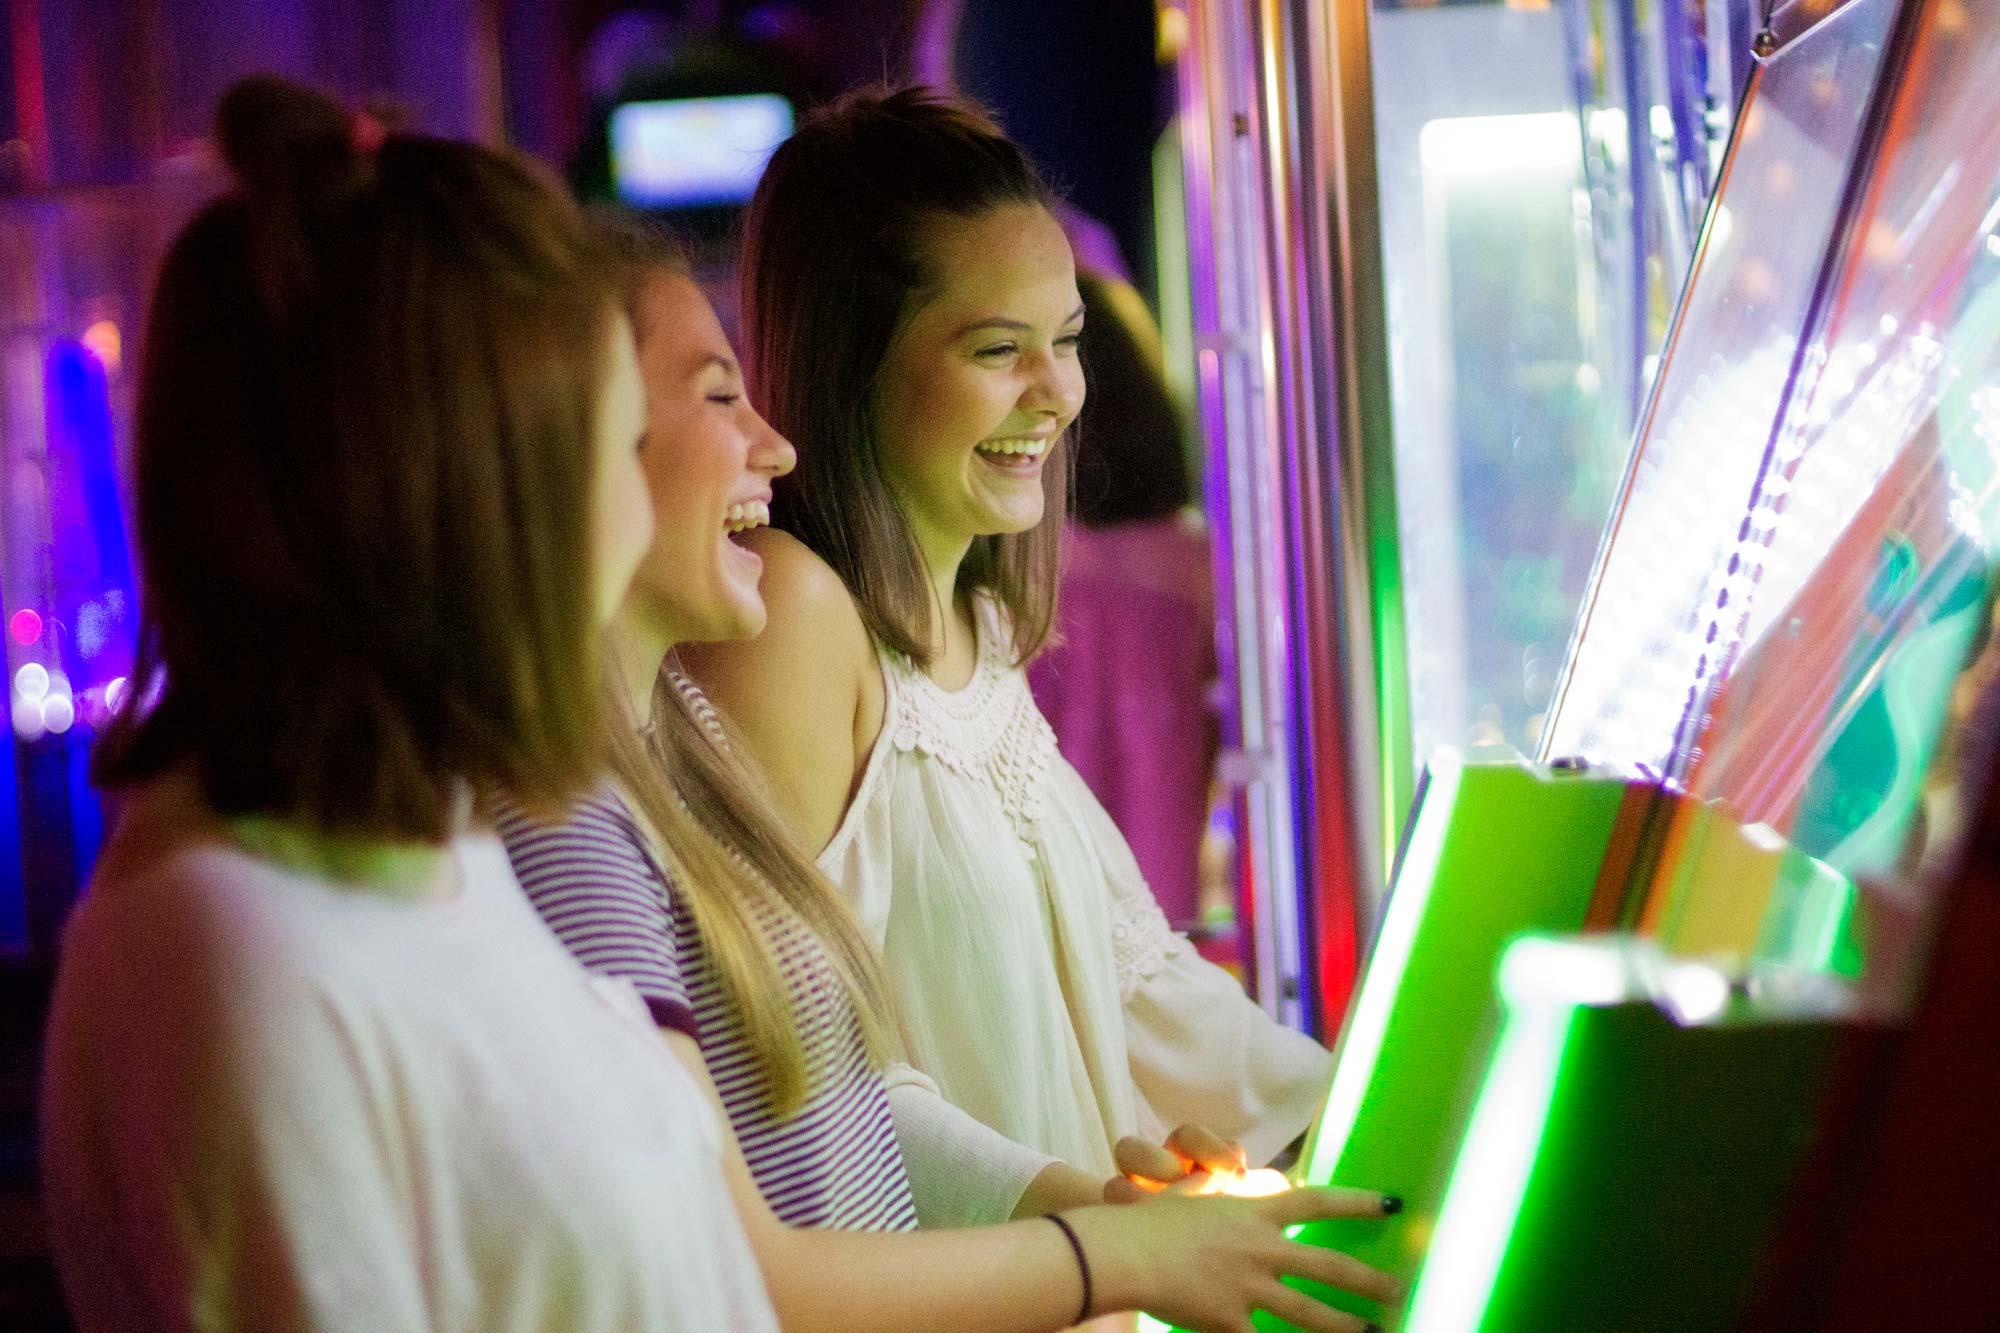 Copy of Fun All Age Arcade